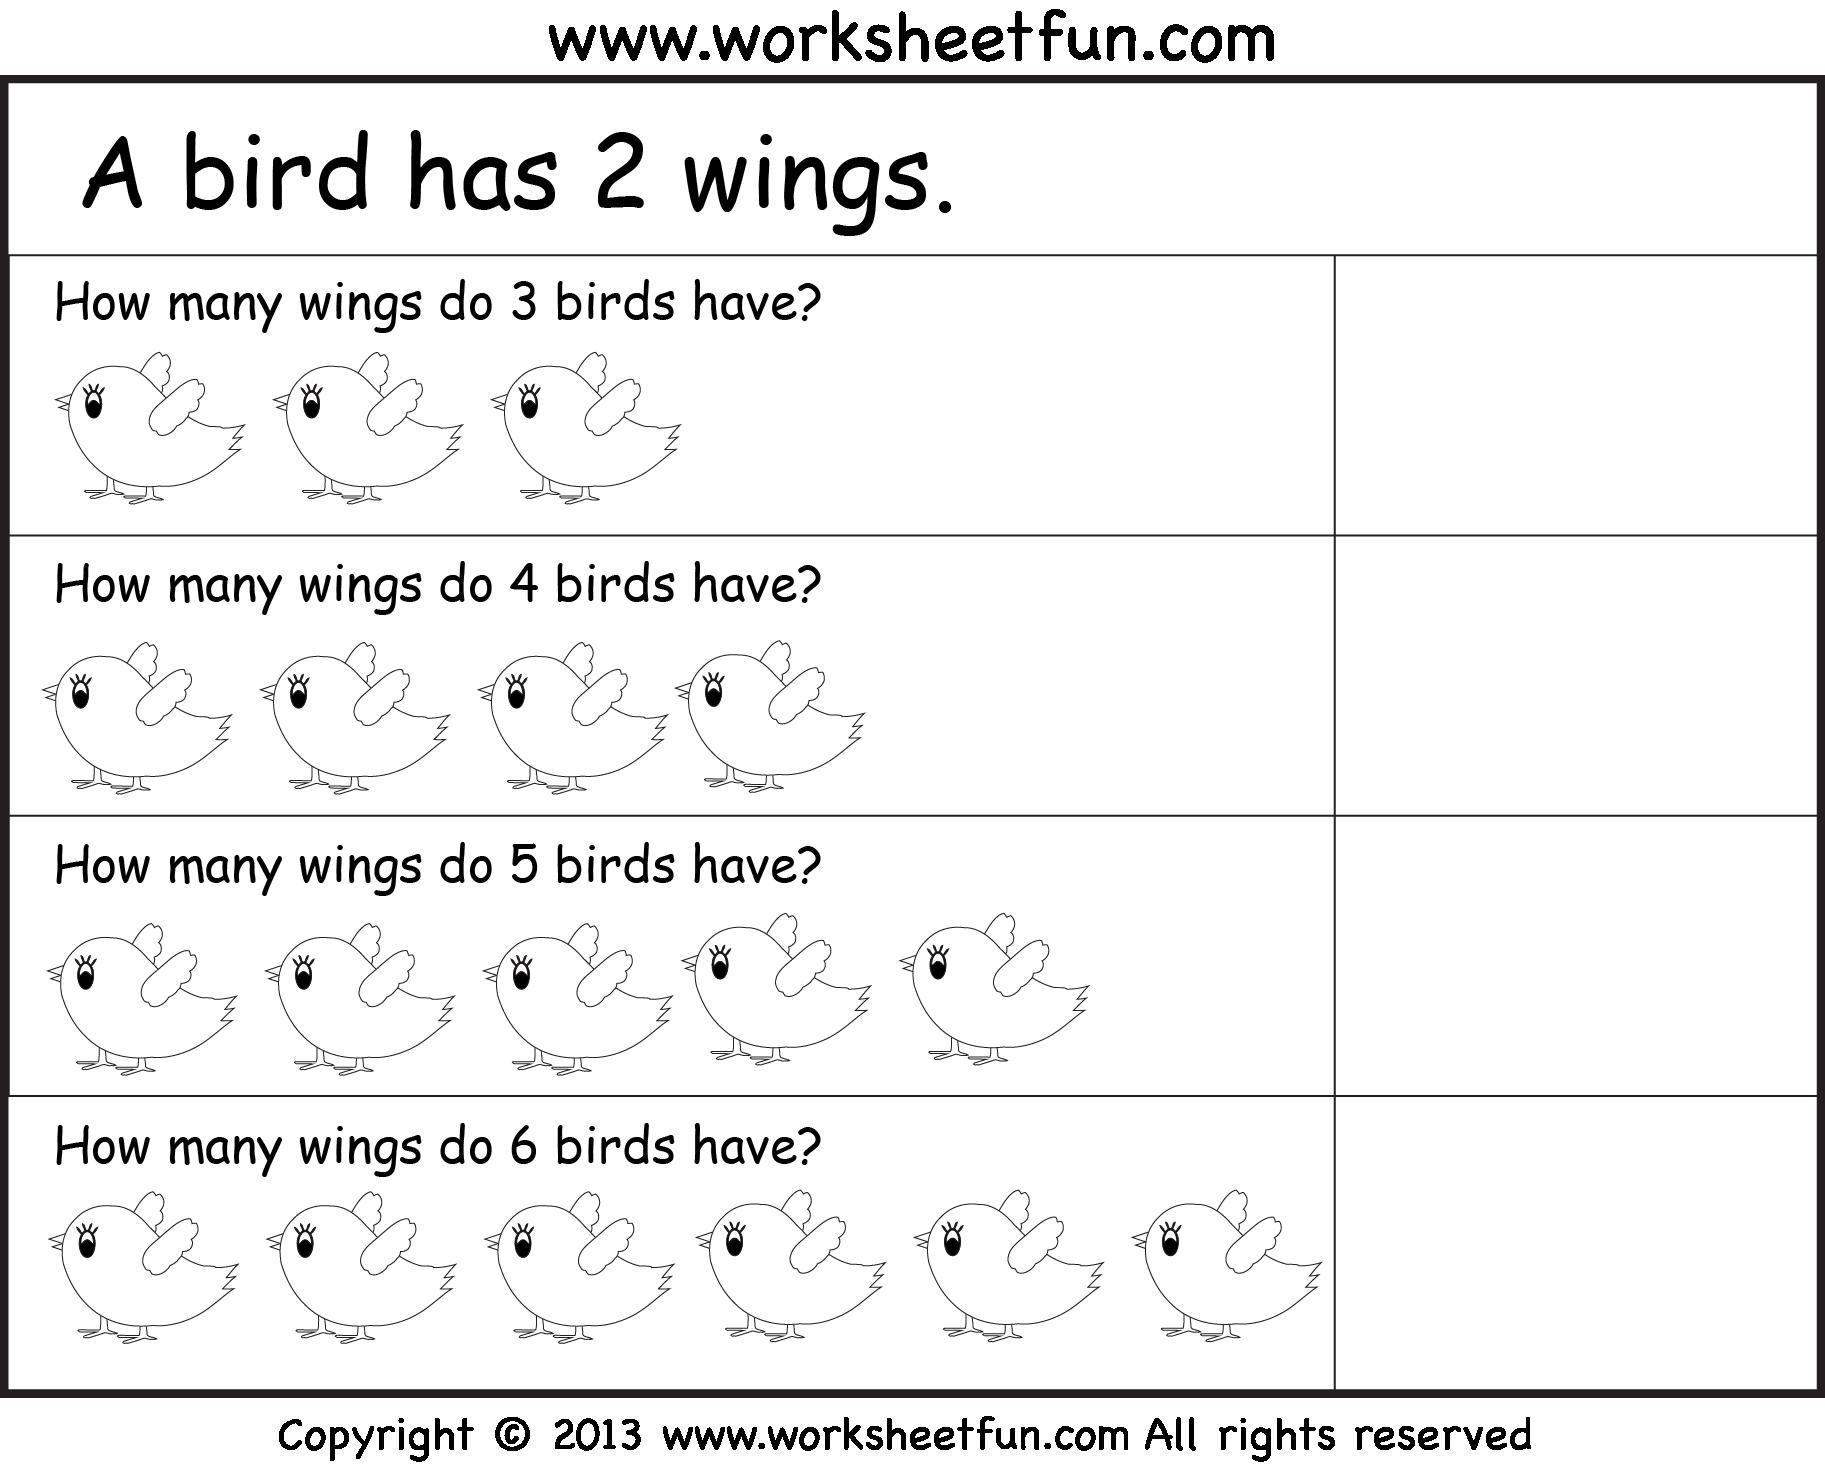 Fresh Ideas - Grade 1 Word Problems Word problems, Math word problems